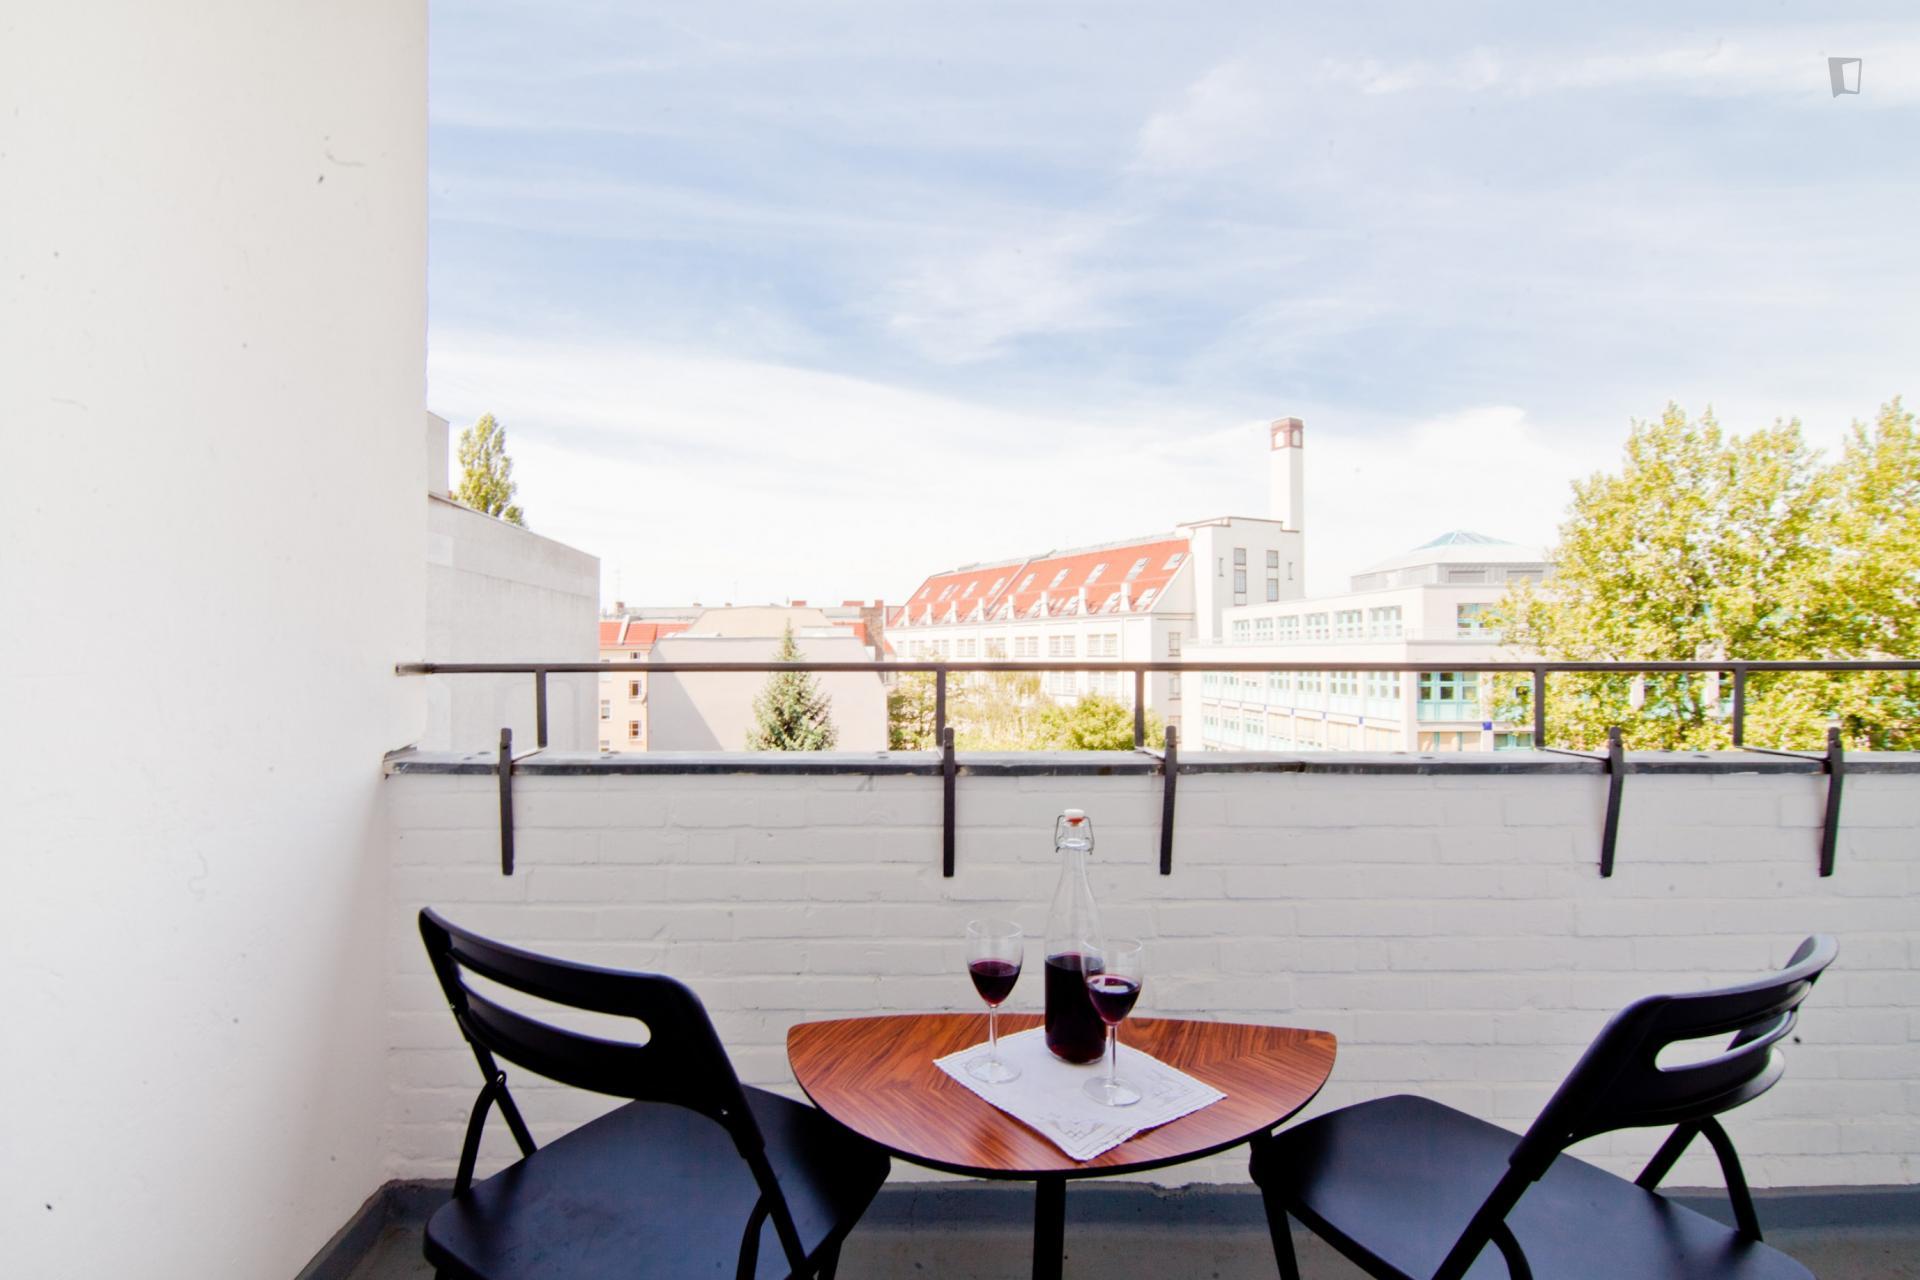 Reinicken - Modern apartment in Berlin with balcony